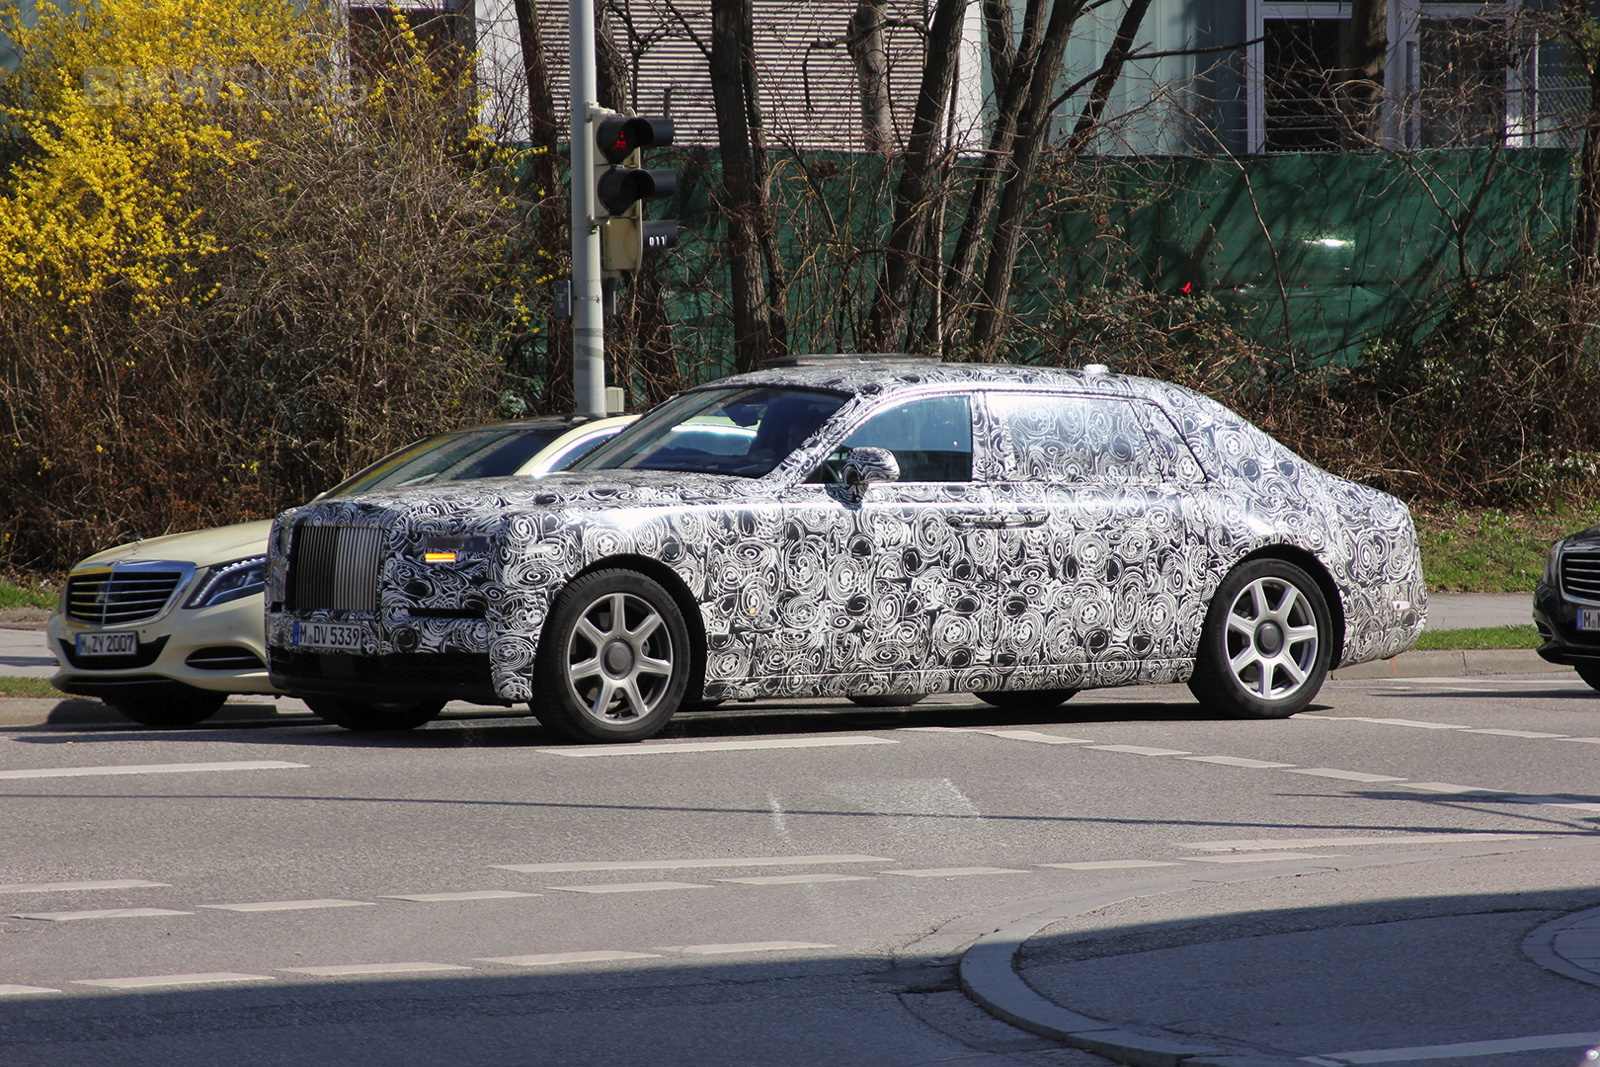 Rolls Royce Phantom 2018 Spy